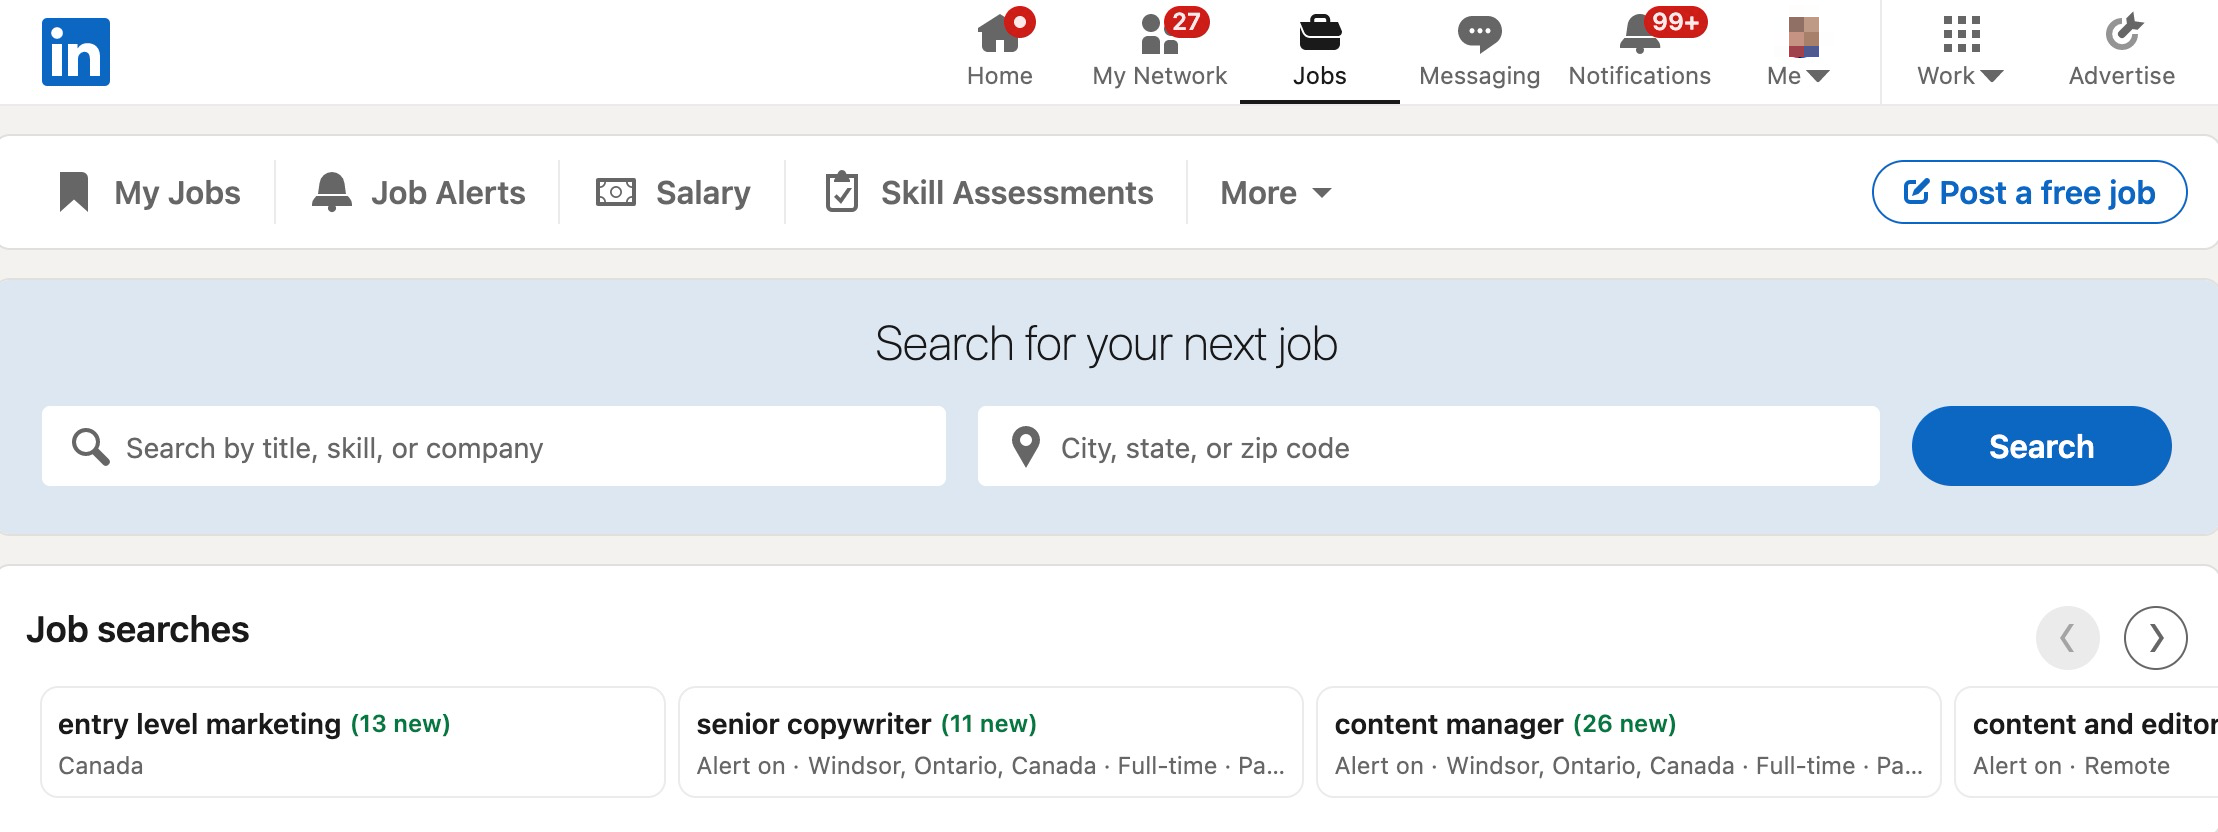 entry level marketing jobs in linkedin